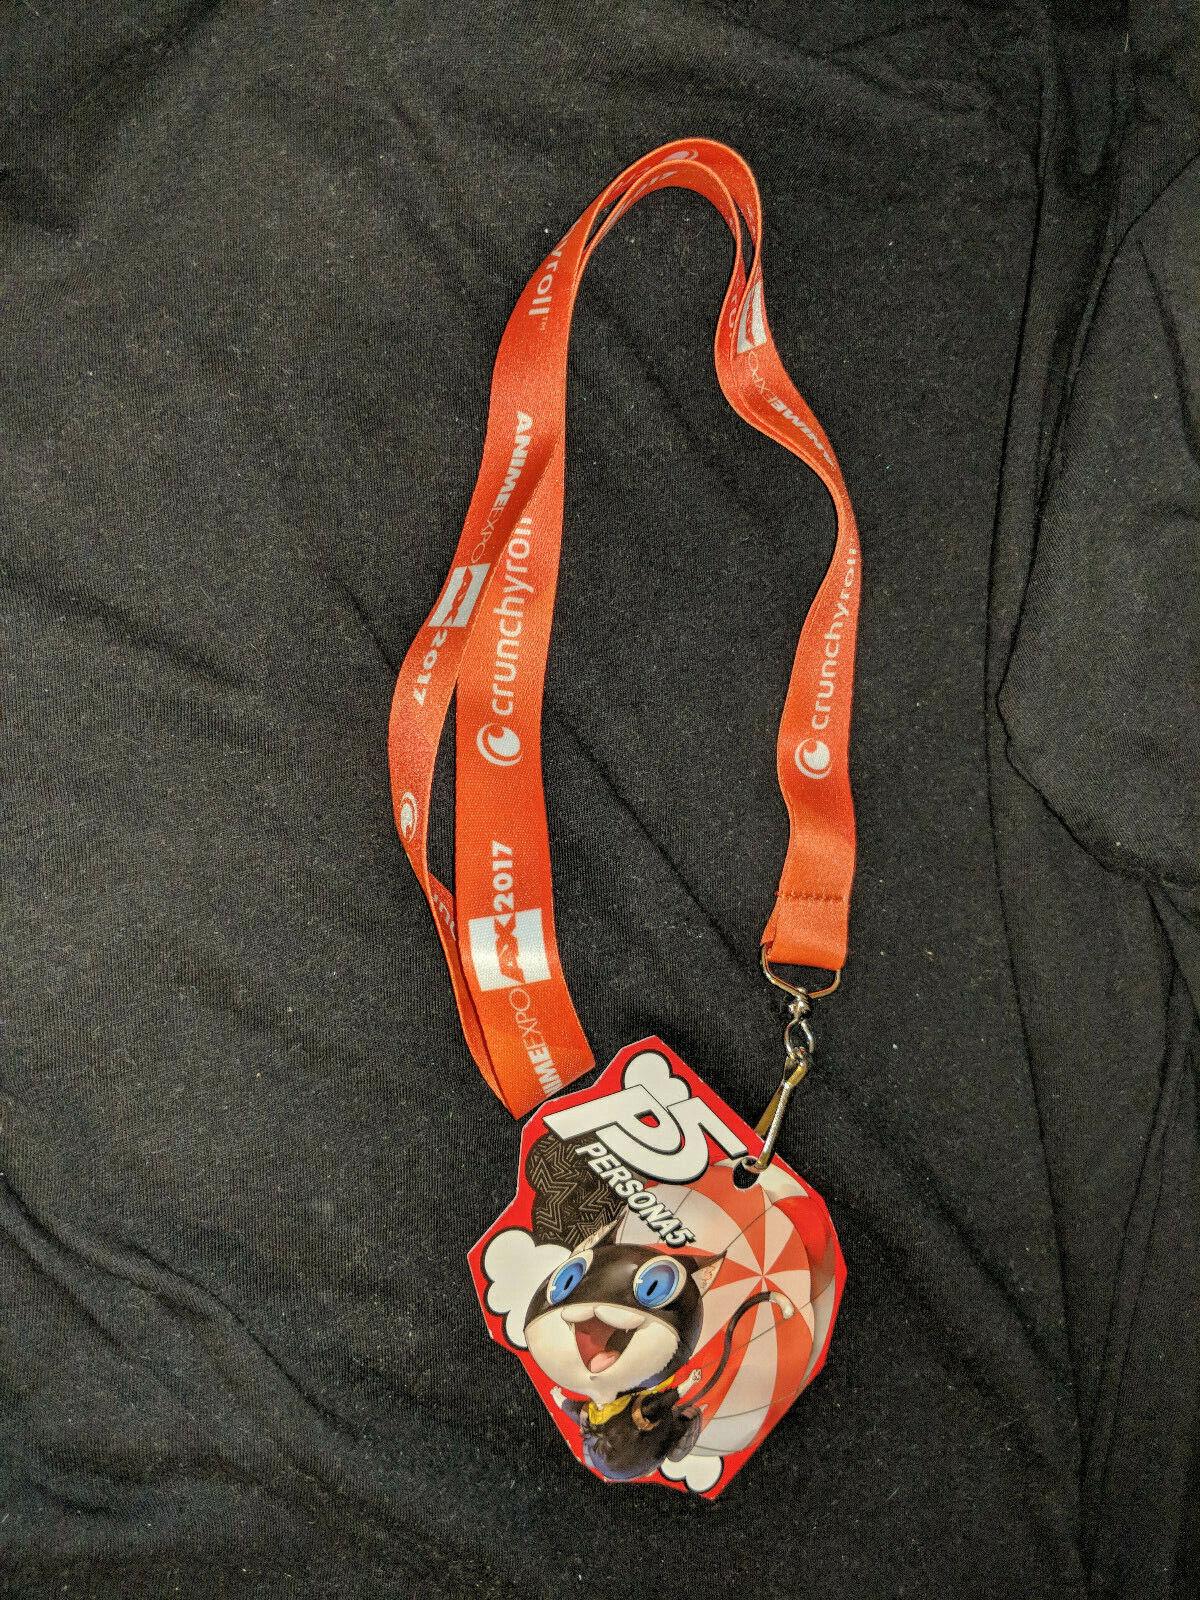 Anime Expo 2017 Crunchyroll Orange Lanyard with Persona 5 promo piece